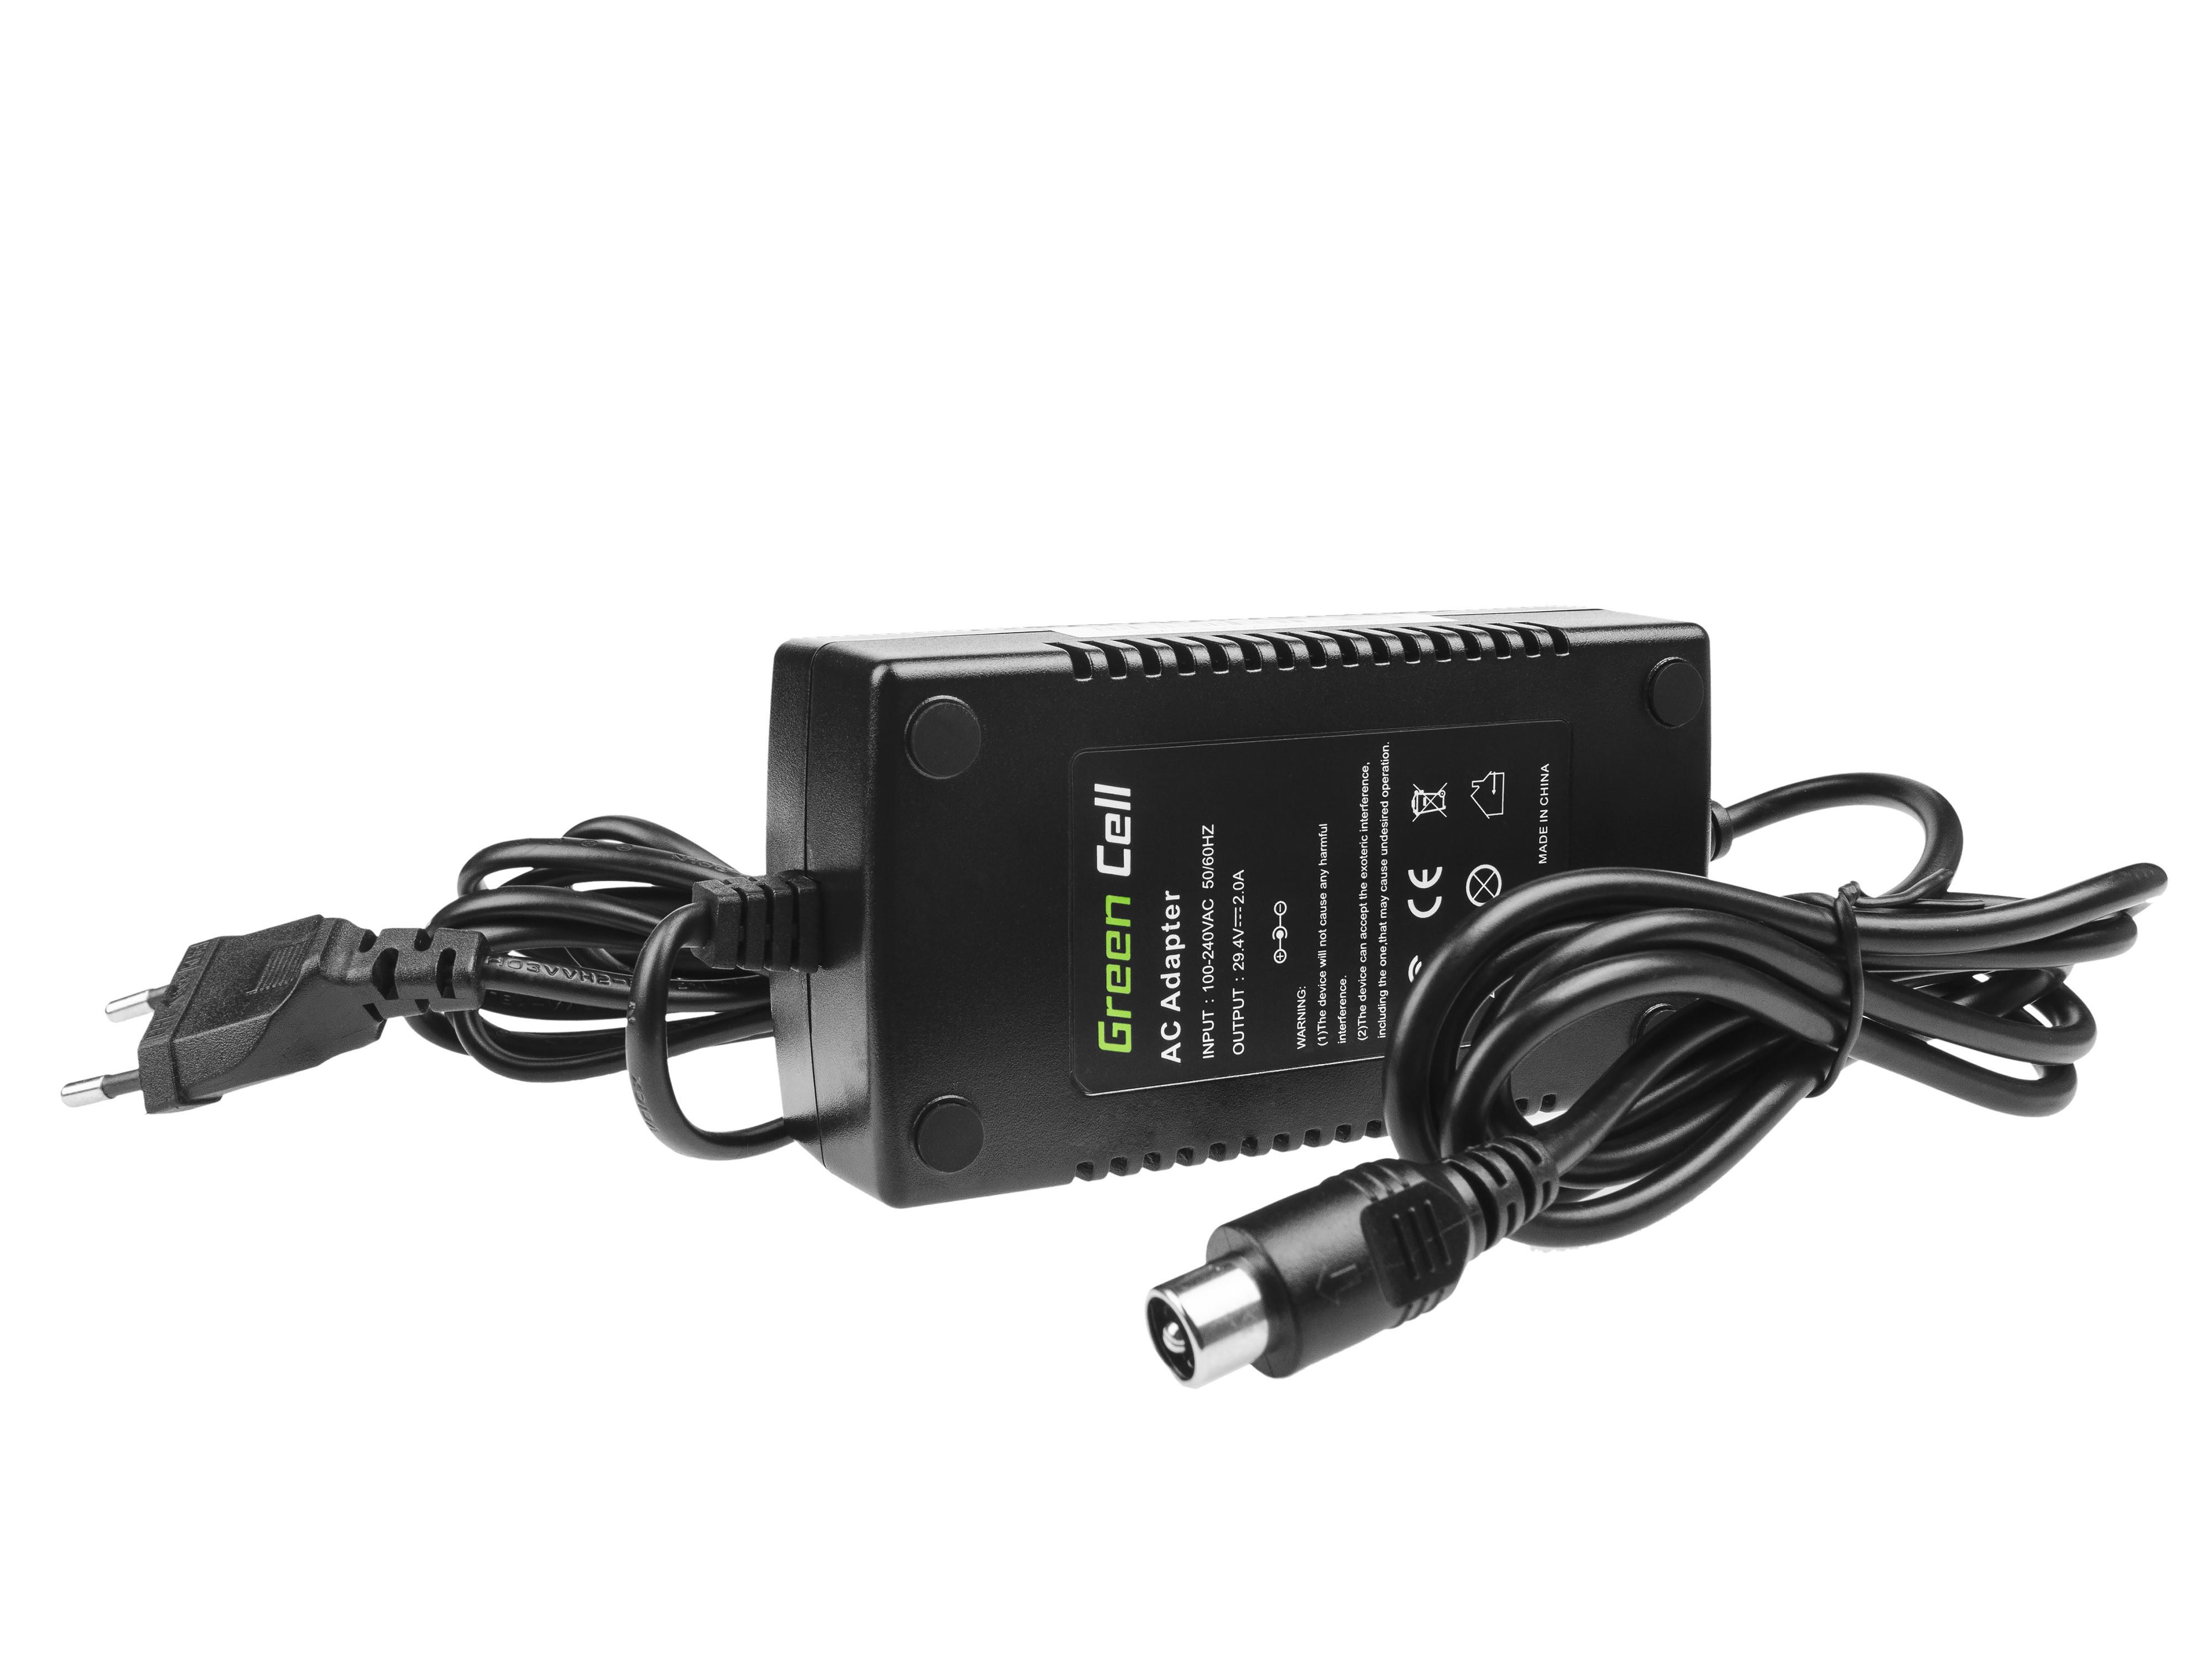 Adaptér GC 29.4V 2A (RCA) pro Baterie - elektrokola EBIKE 24V